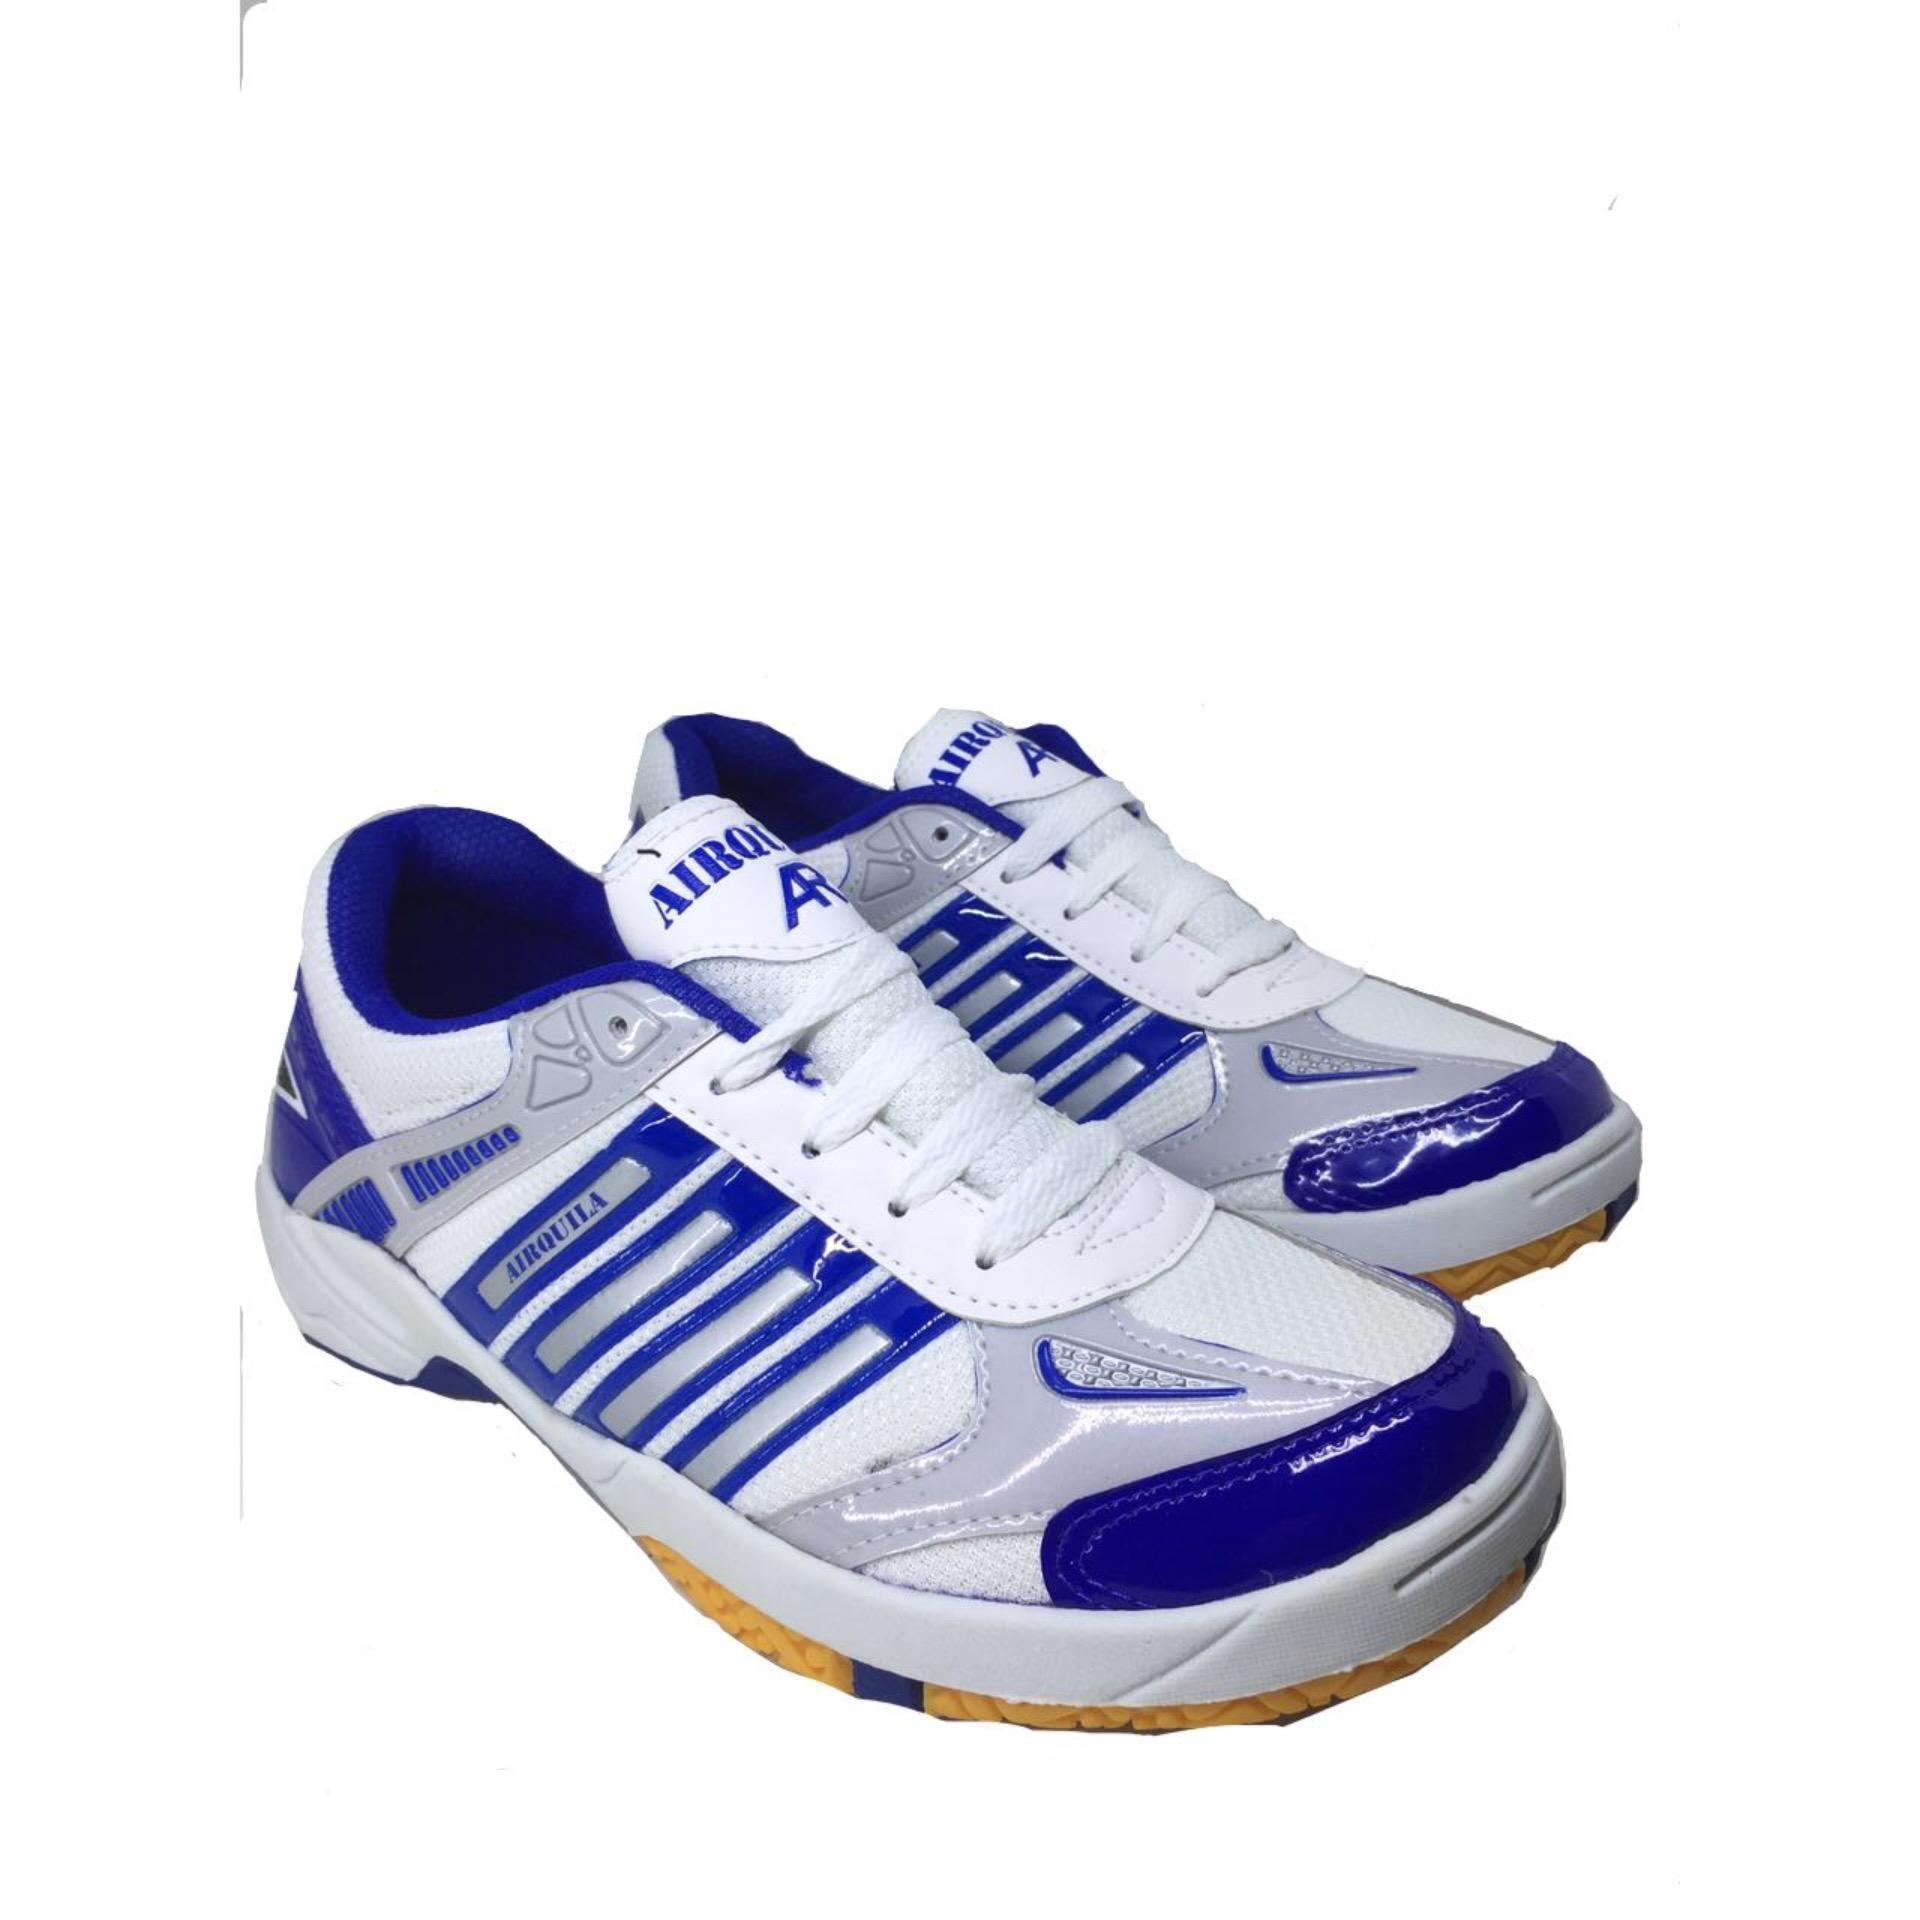 Adinova Airquila Sepatu Pria Sport dan Santai Keren Murah Kece A04 New Series